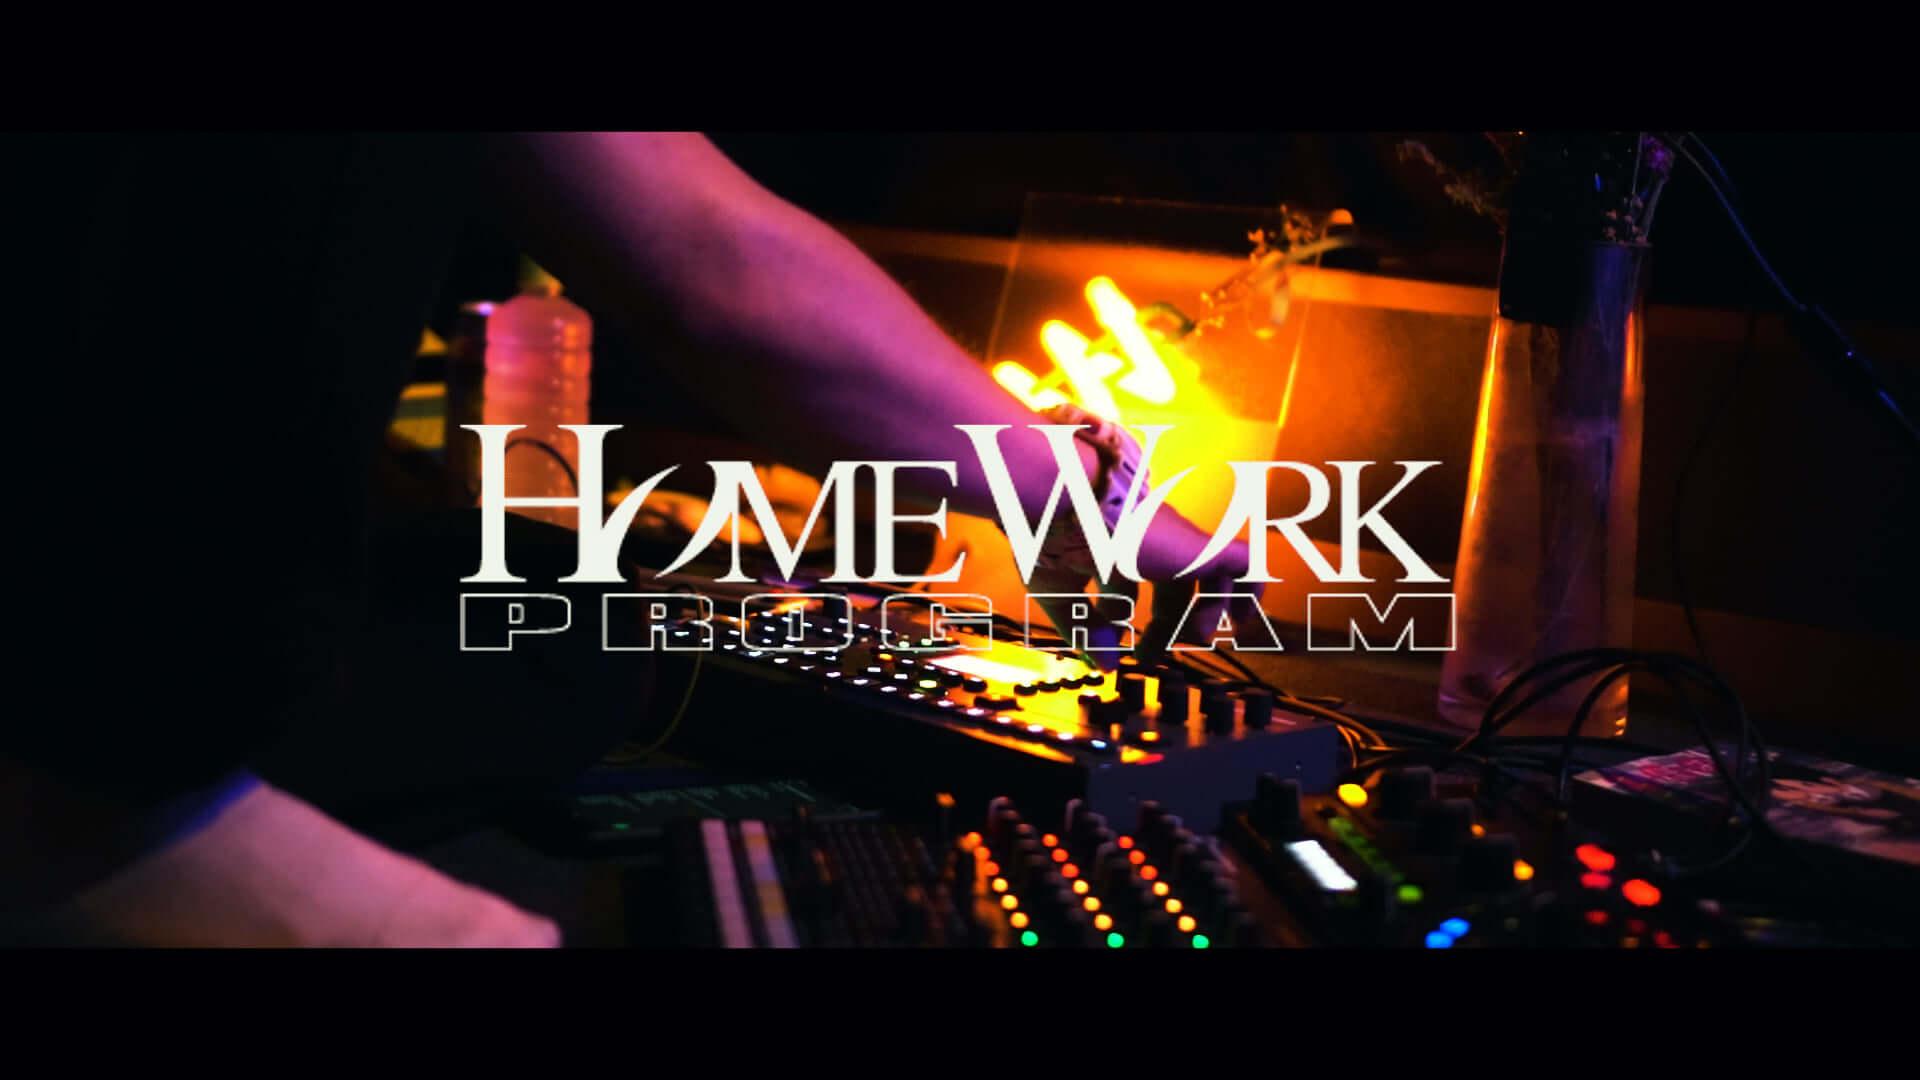 Sugar's Campaignでも活動するAvec Avecが、謎の部屋から行われるライブ配信番組『HOMEWORK PROGRAM』に出演決定! music200527_homework_program_4-1920x1080